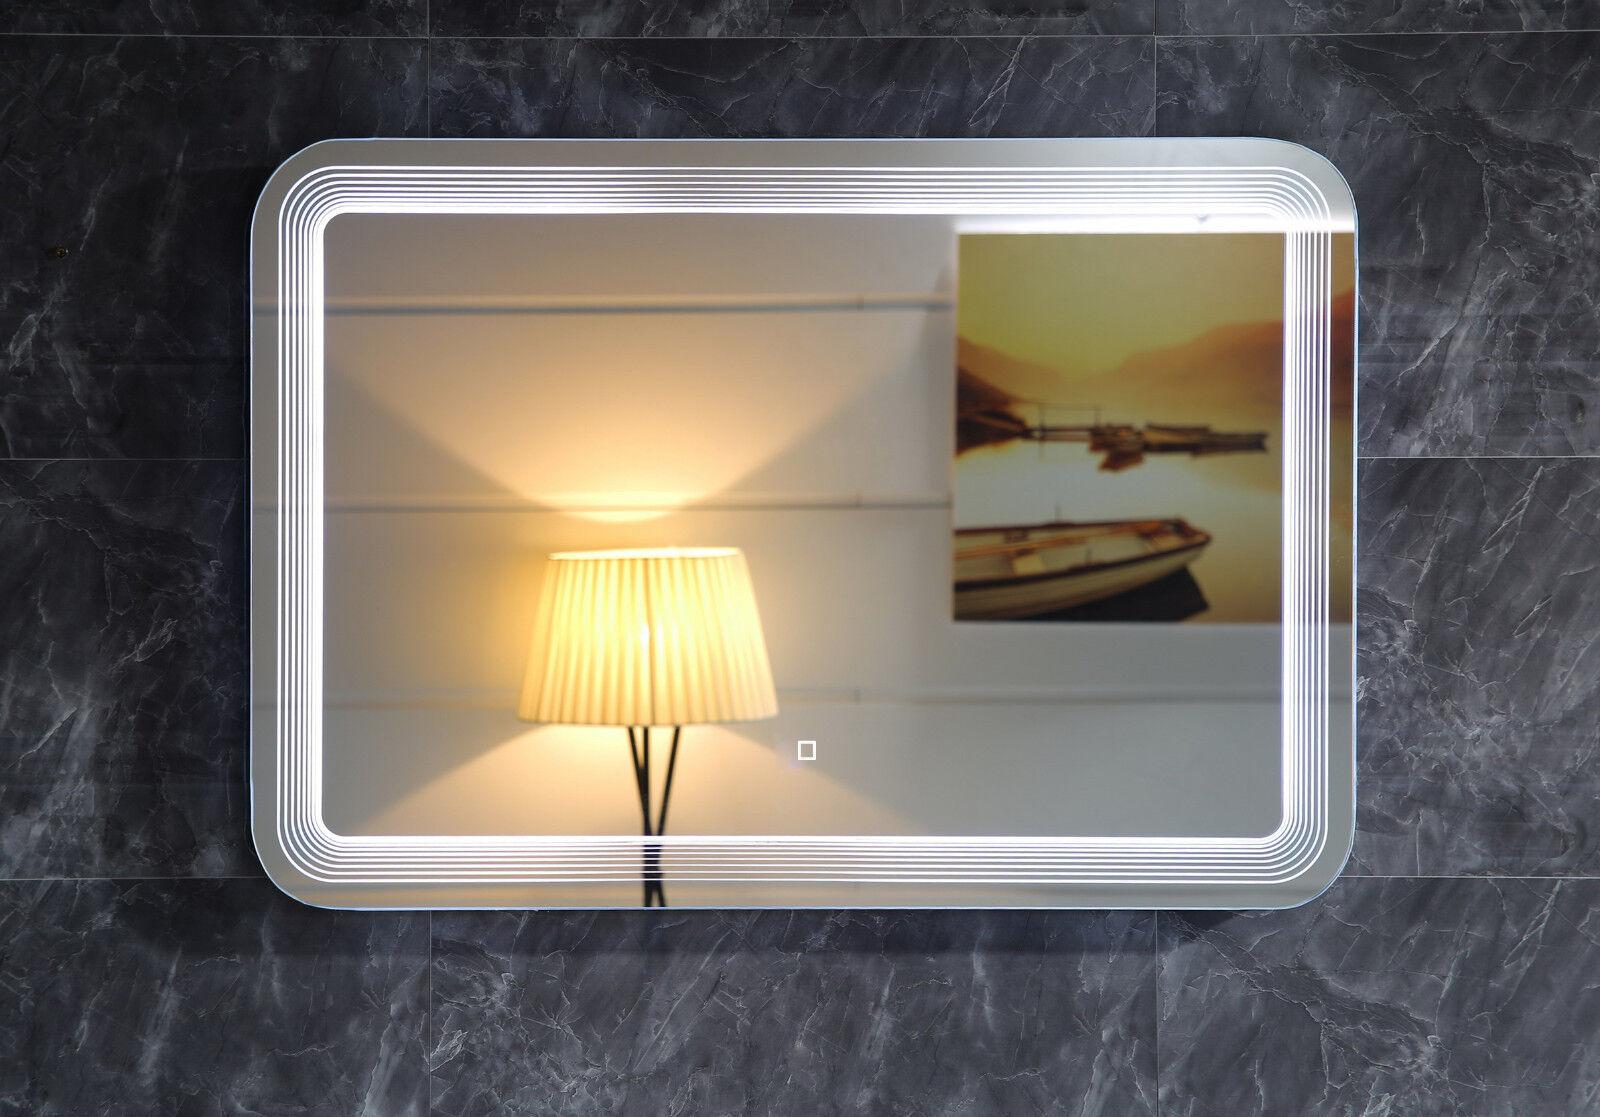 Design LED-Beleuchtung Badspiegel GS086 Lichtspiegel Wandspiegel Touch-Schalter